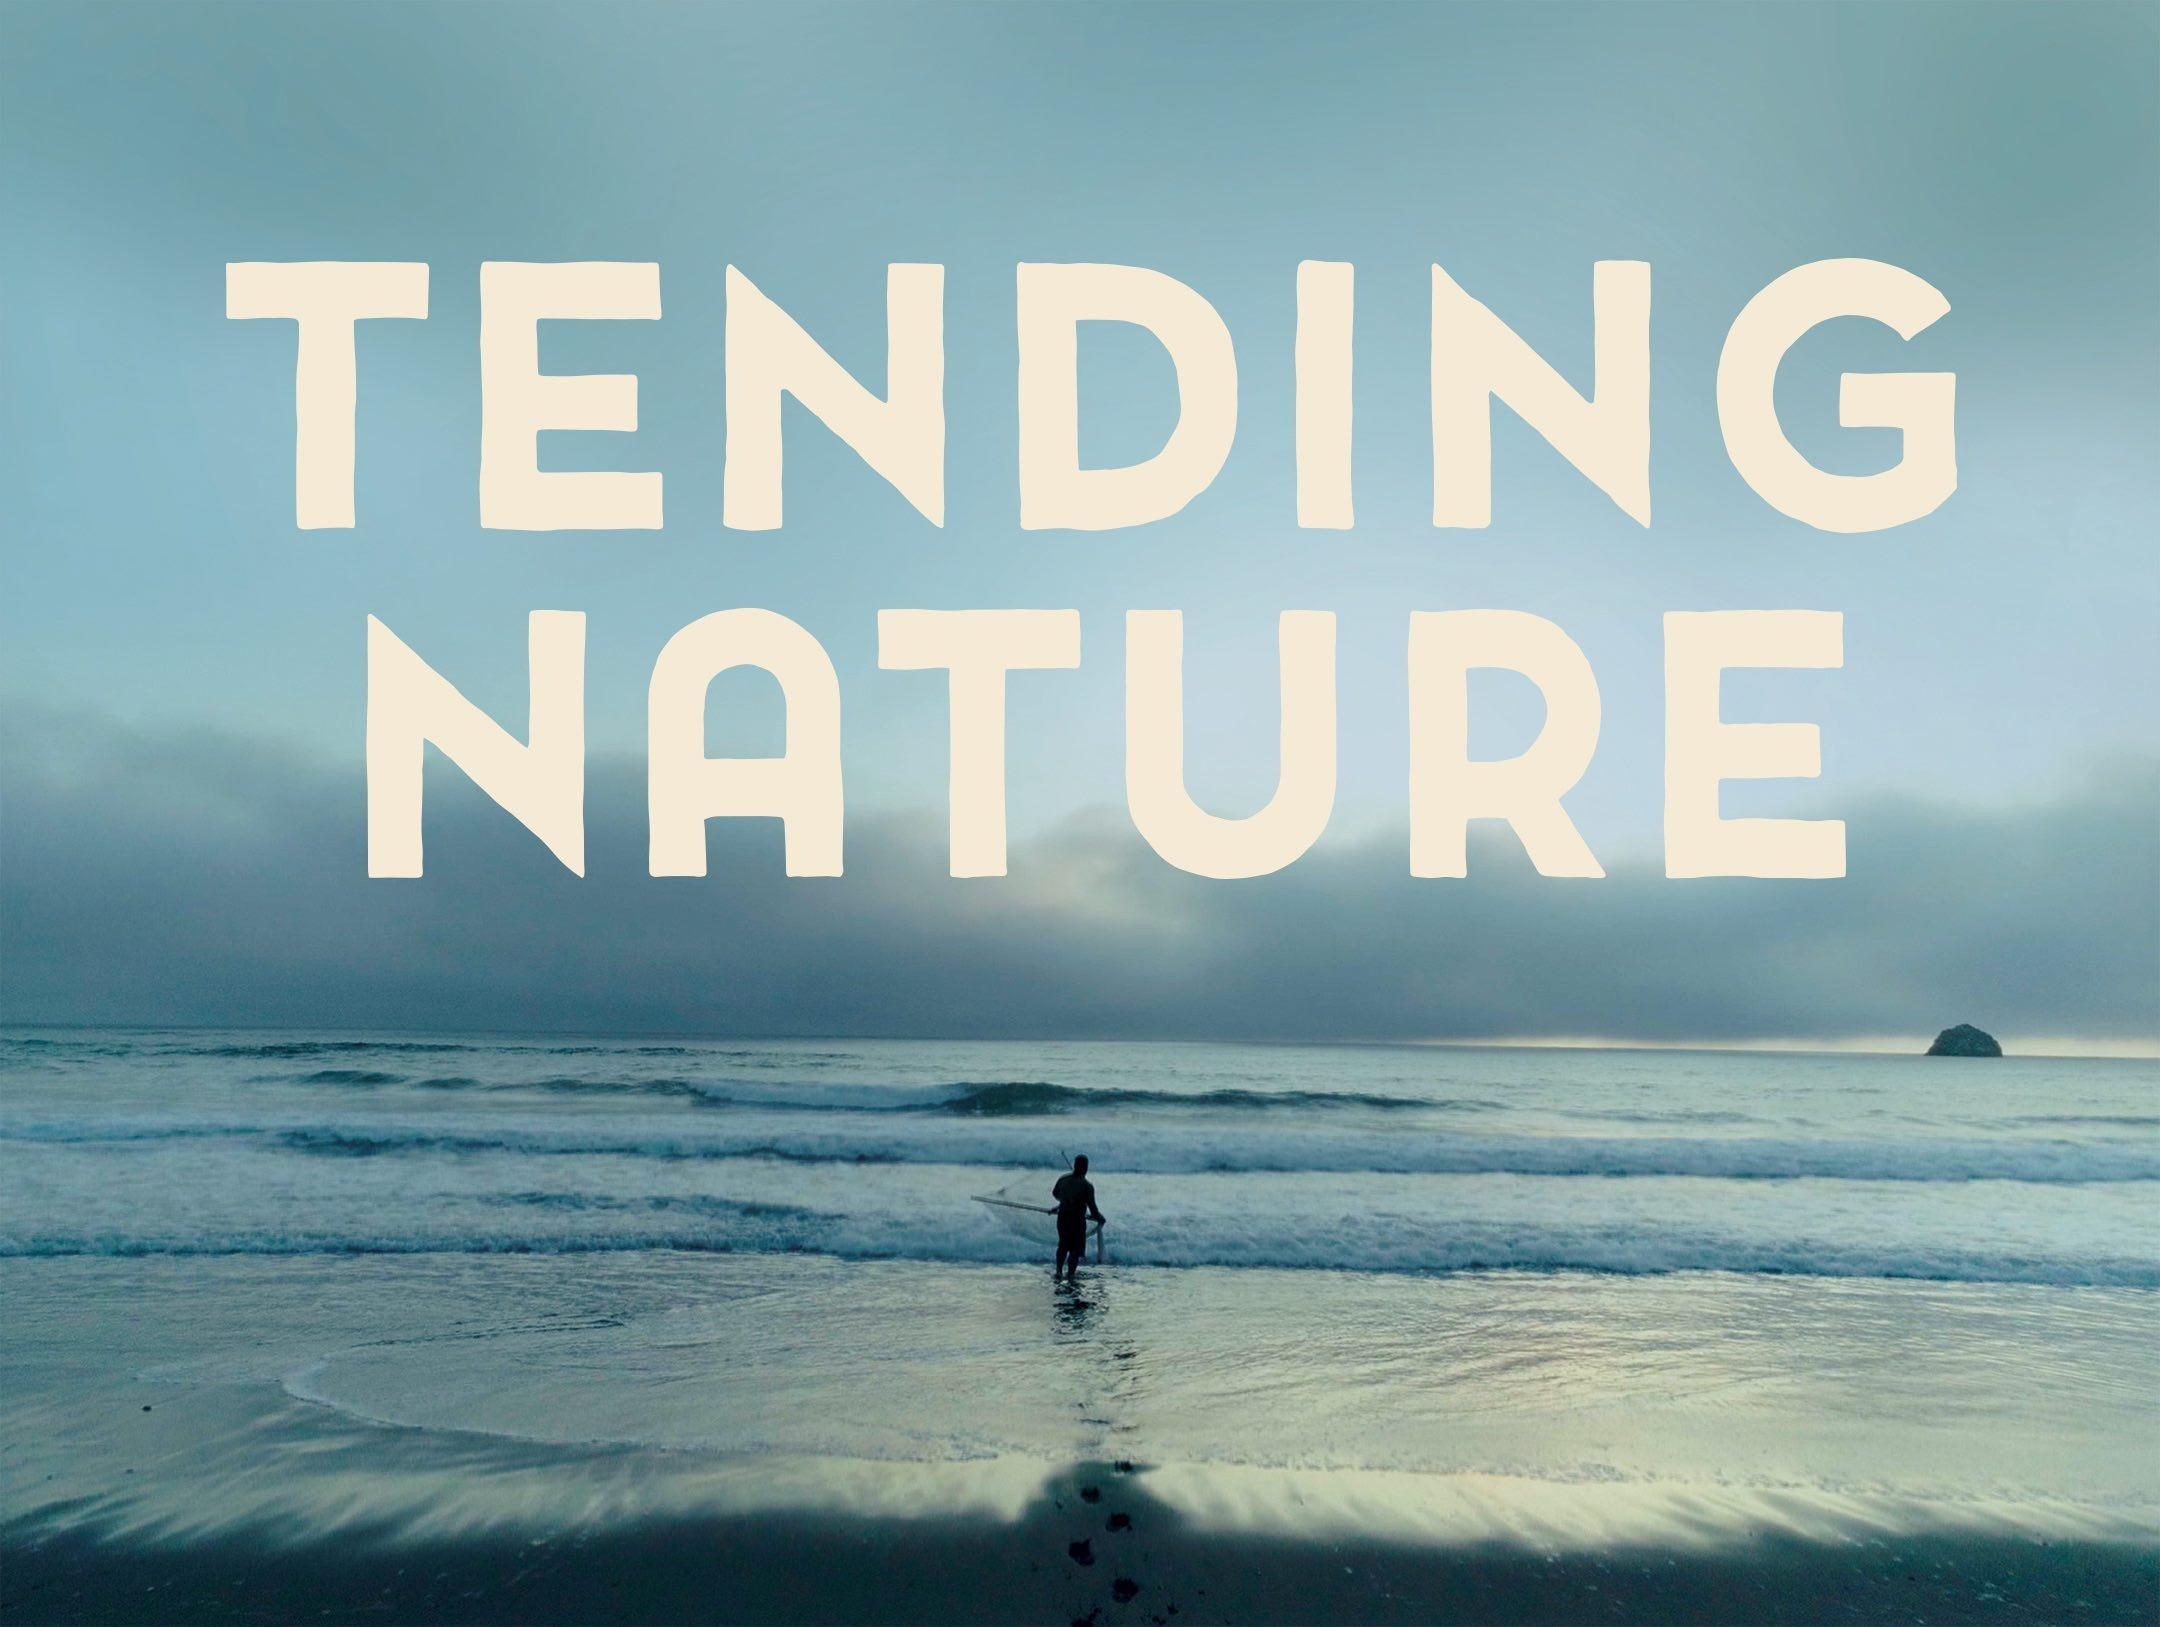 Tending Nature image